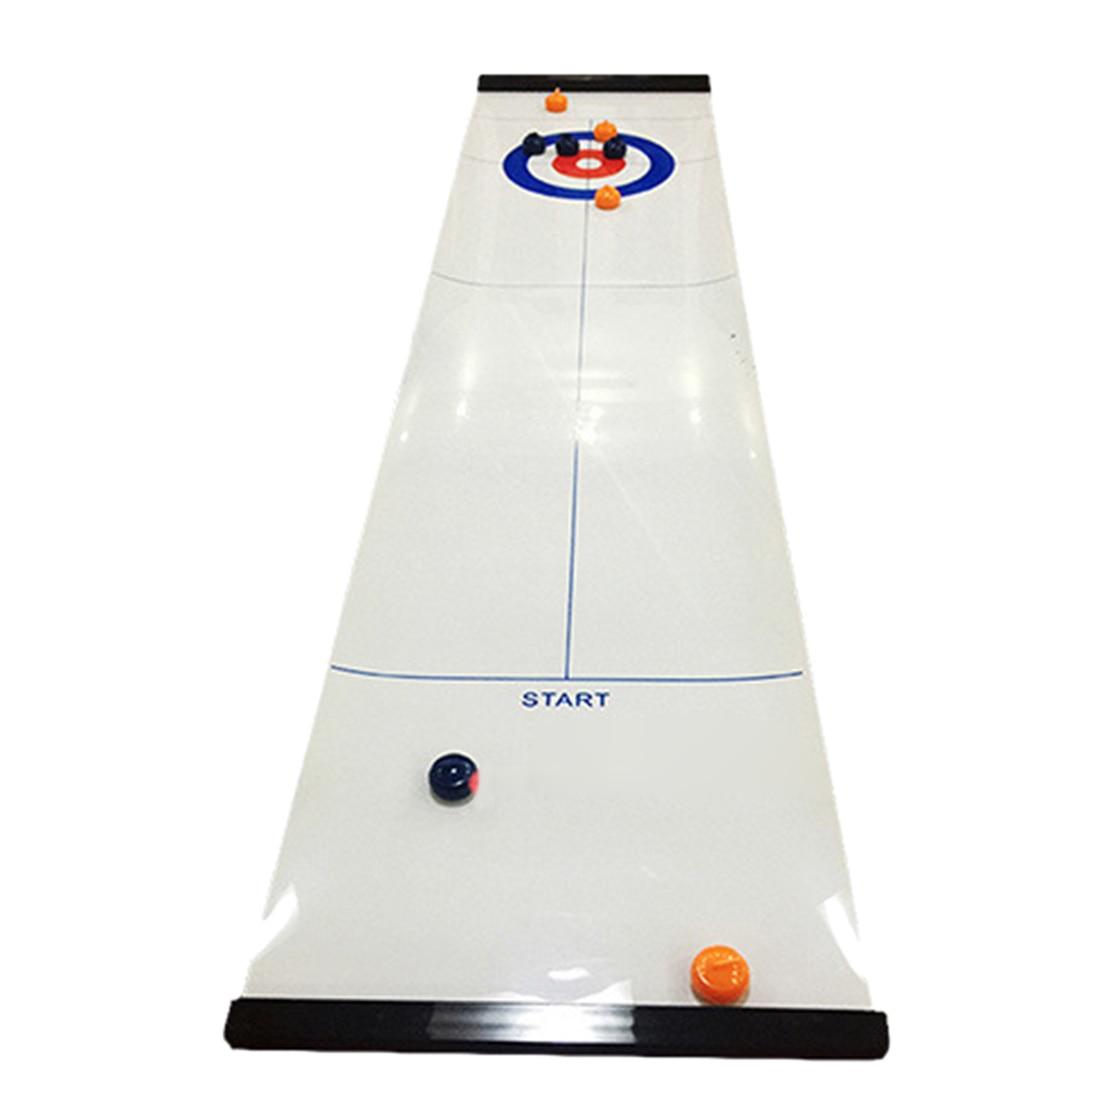 Curling Game(Shuffleboard) - Tabletop Game